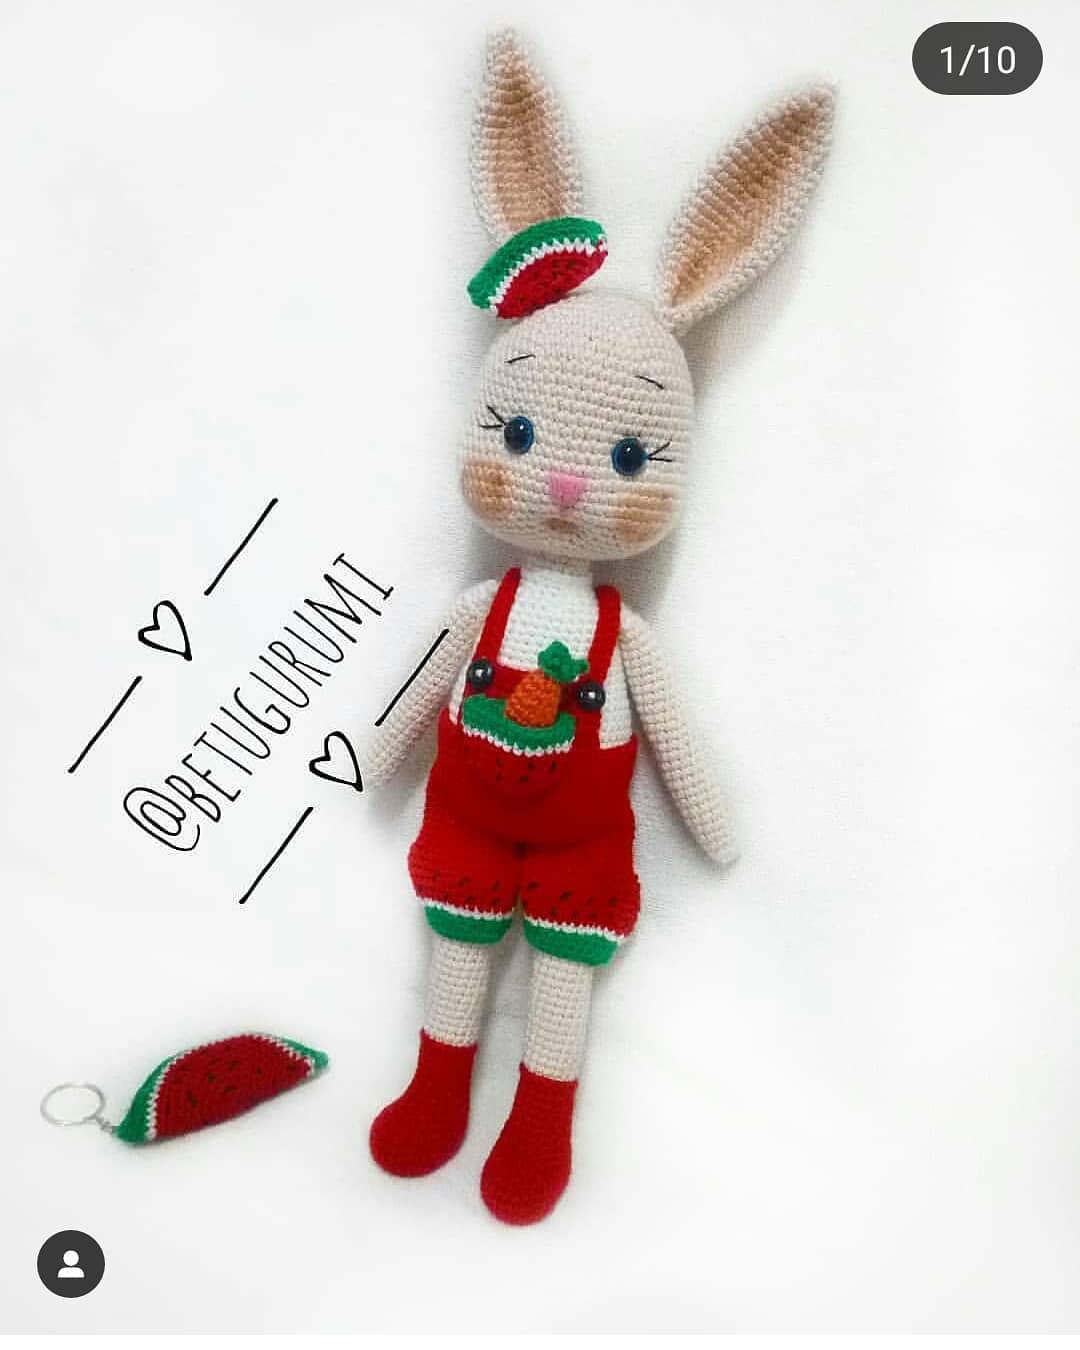 Amigurumi Watermelon Overalls Bunny Free Crochet Pattern